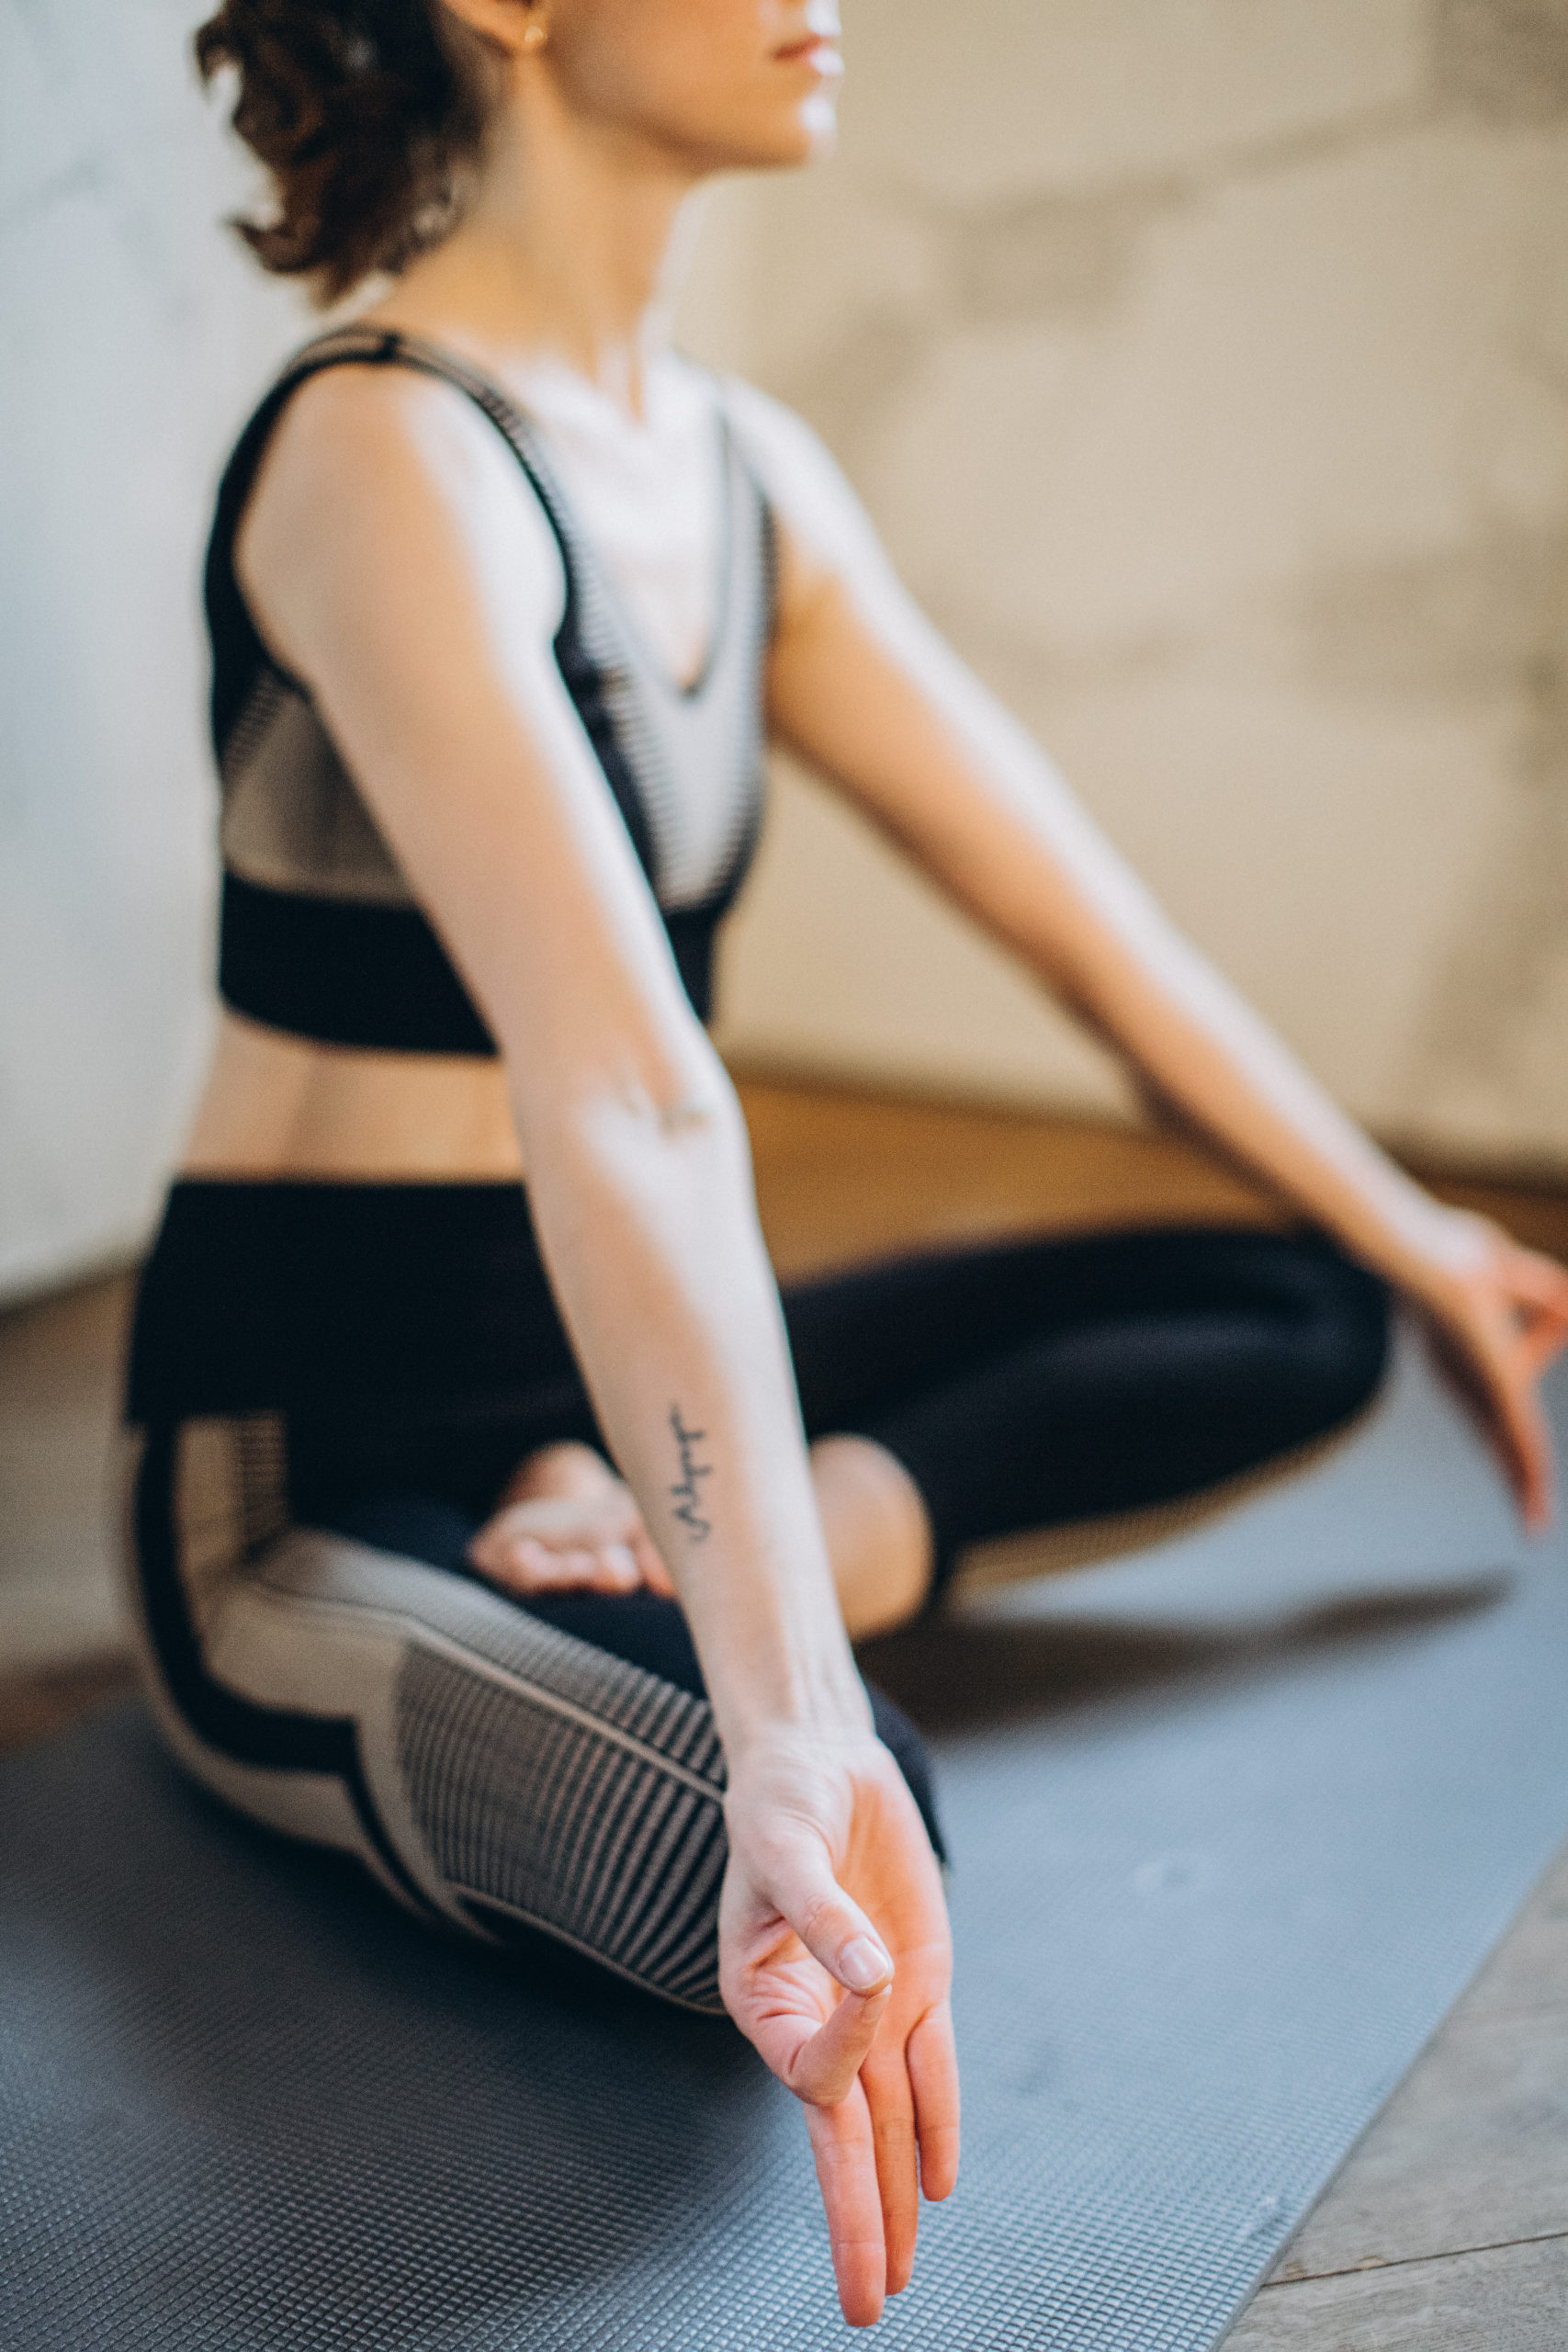 yoag-comment-bien-respirer-au-yoga